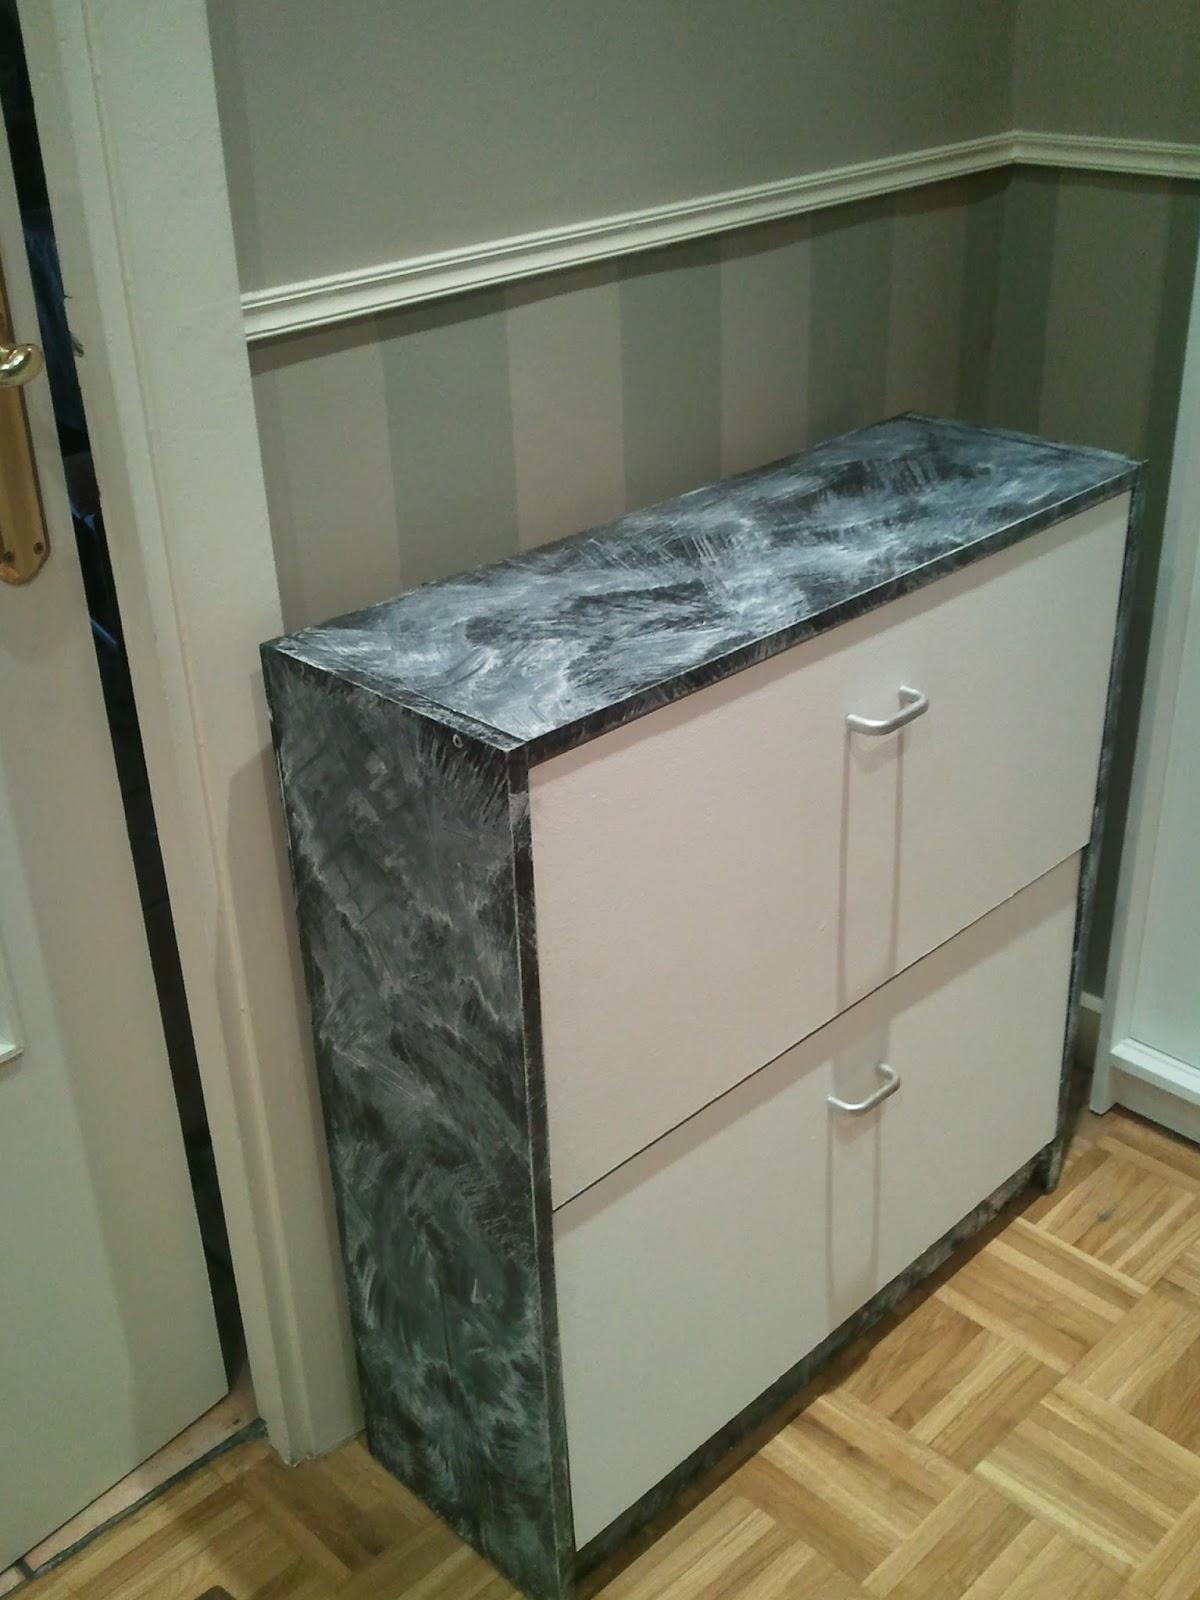 Pintar muebles de cocina melamina ideas - Hacer mueble zapatero ...